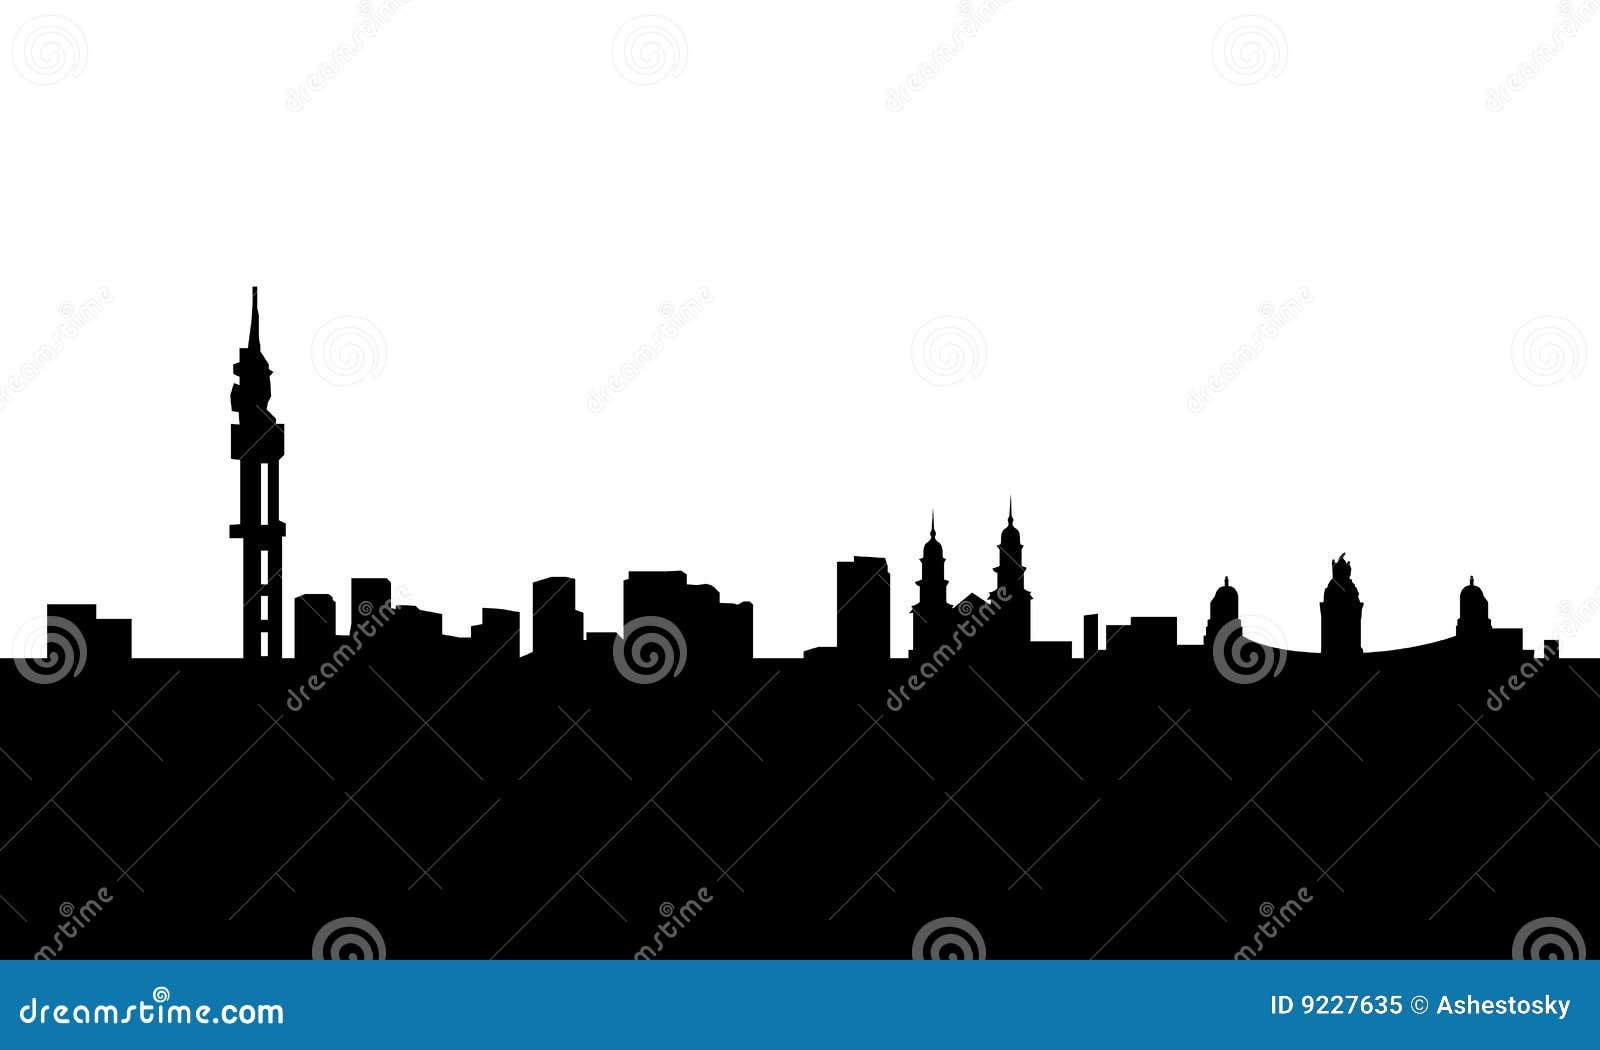 Pretoria City Skyline Vector Isolated Royalty Free Stock Photo ...